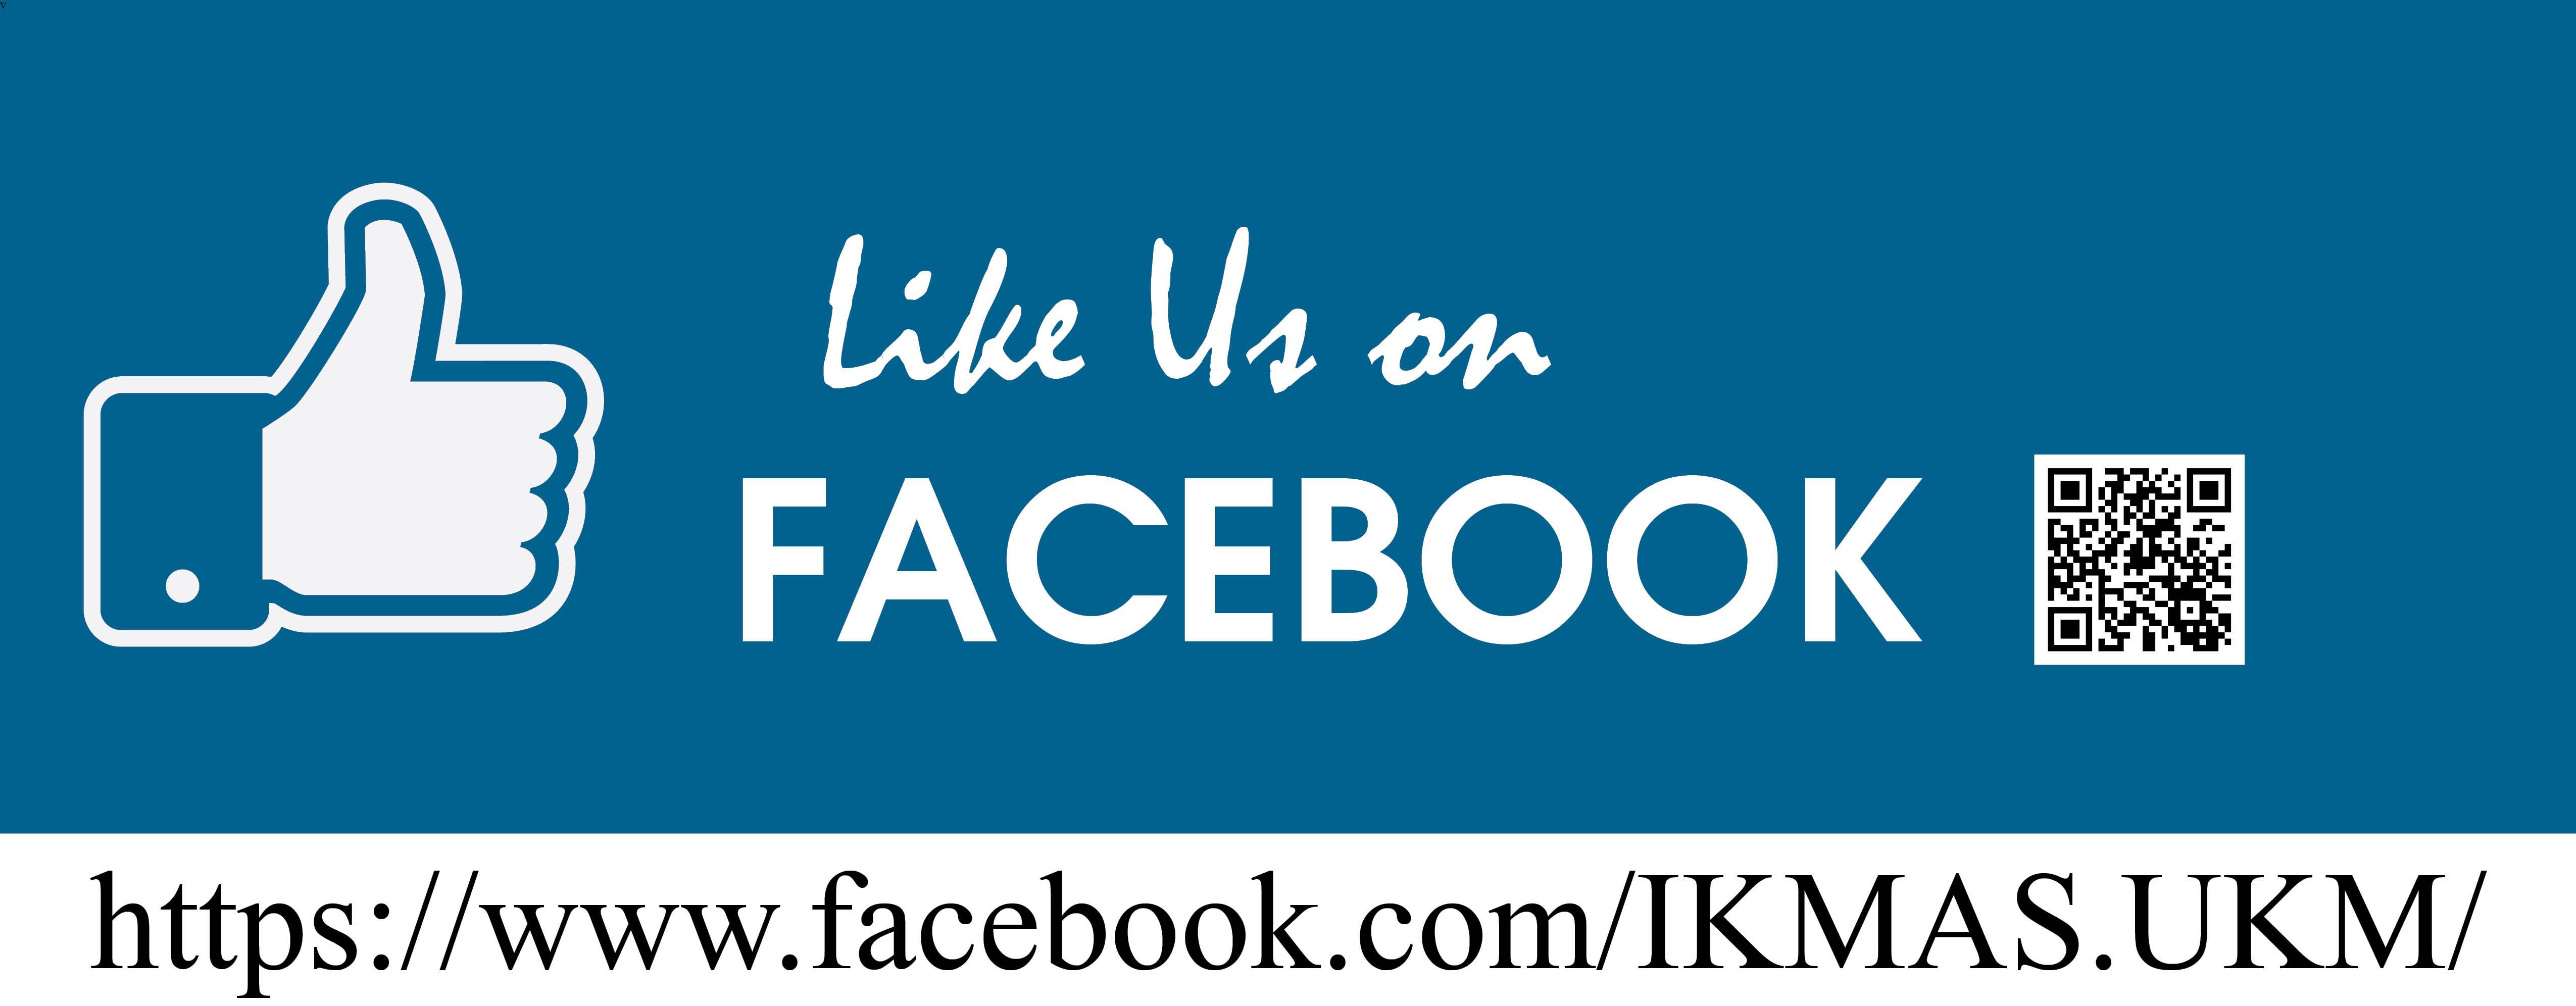 likeusonfacebook3